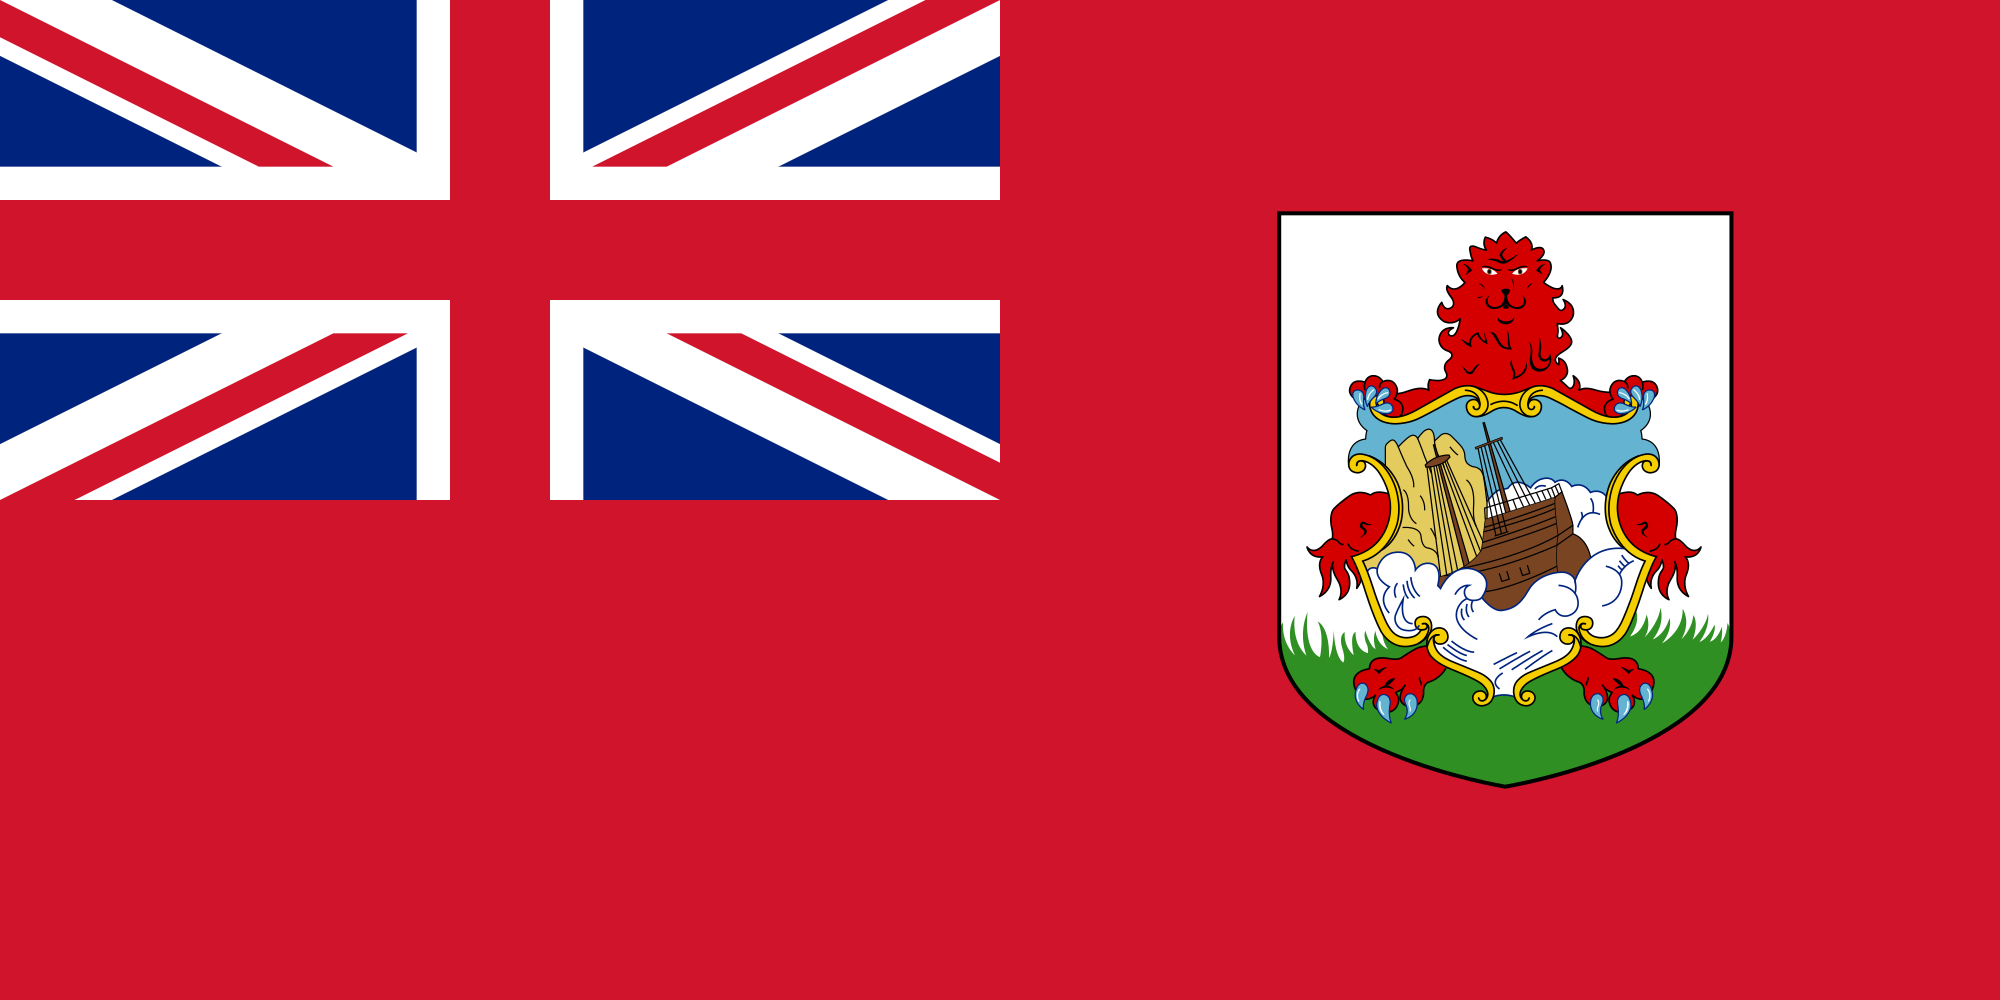 Bermuda | Blockchain Startup Shyft | Memorandum of Understanding | USD 10 Million | Blockchain in Bermuda | Blockchain updates